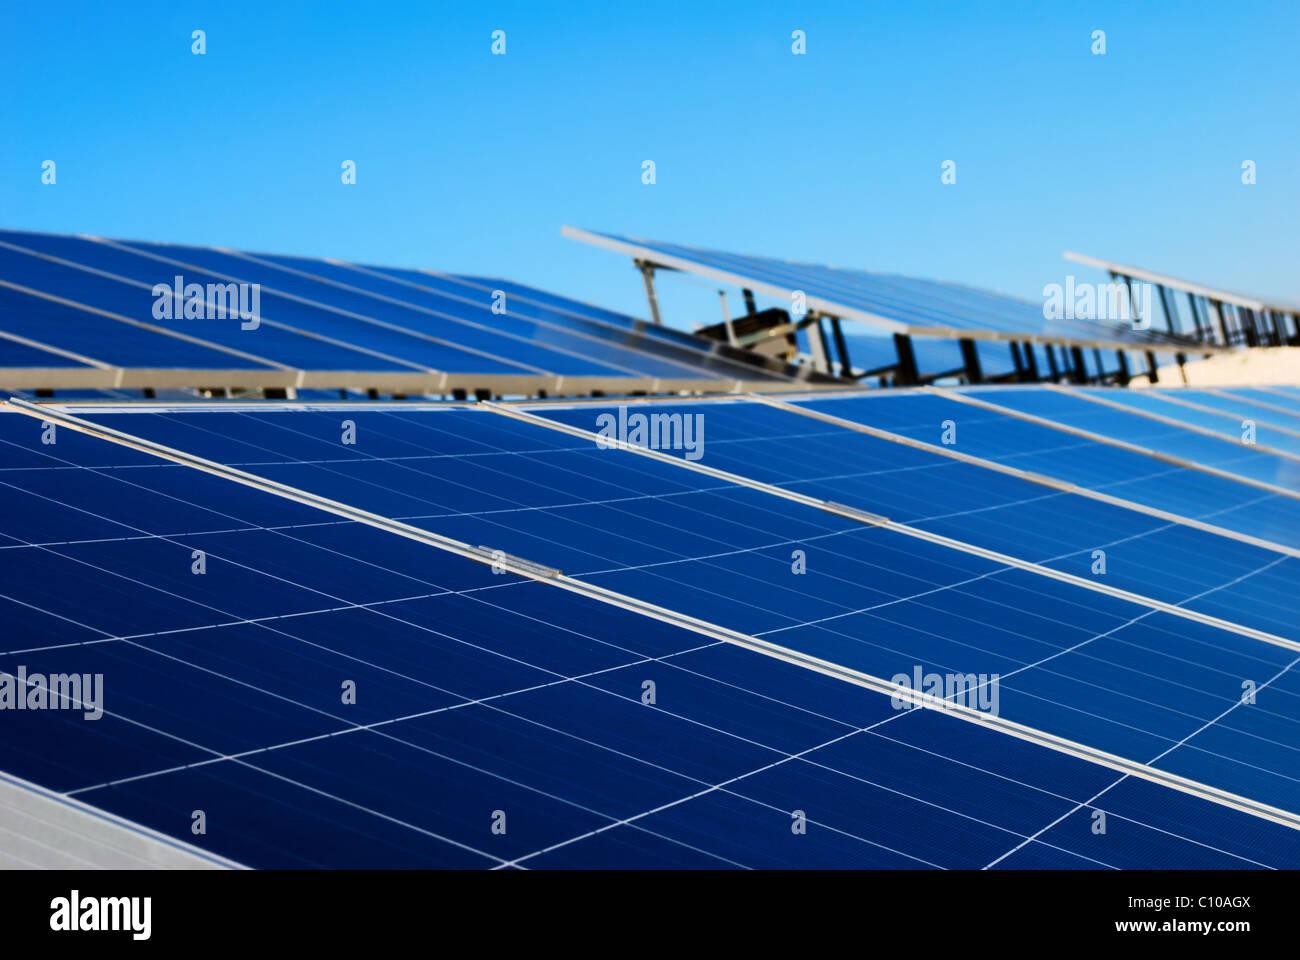 Instalación de panel solar azul Imagen De Stock